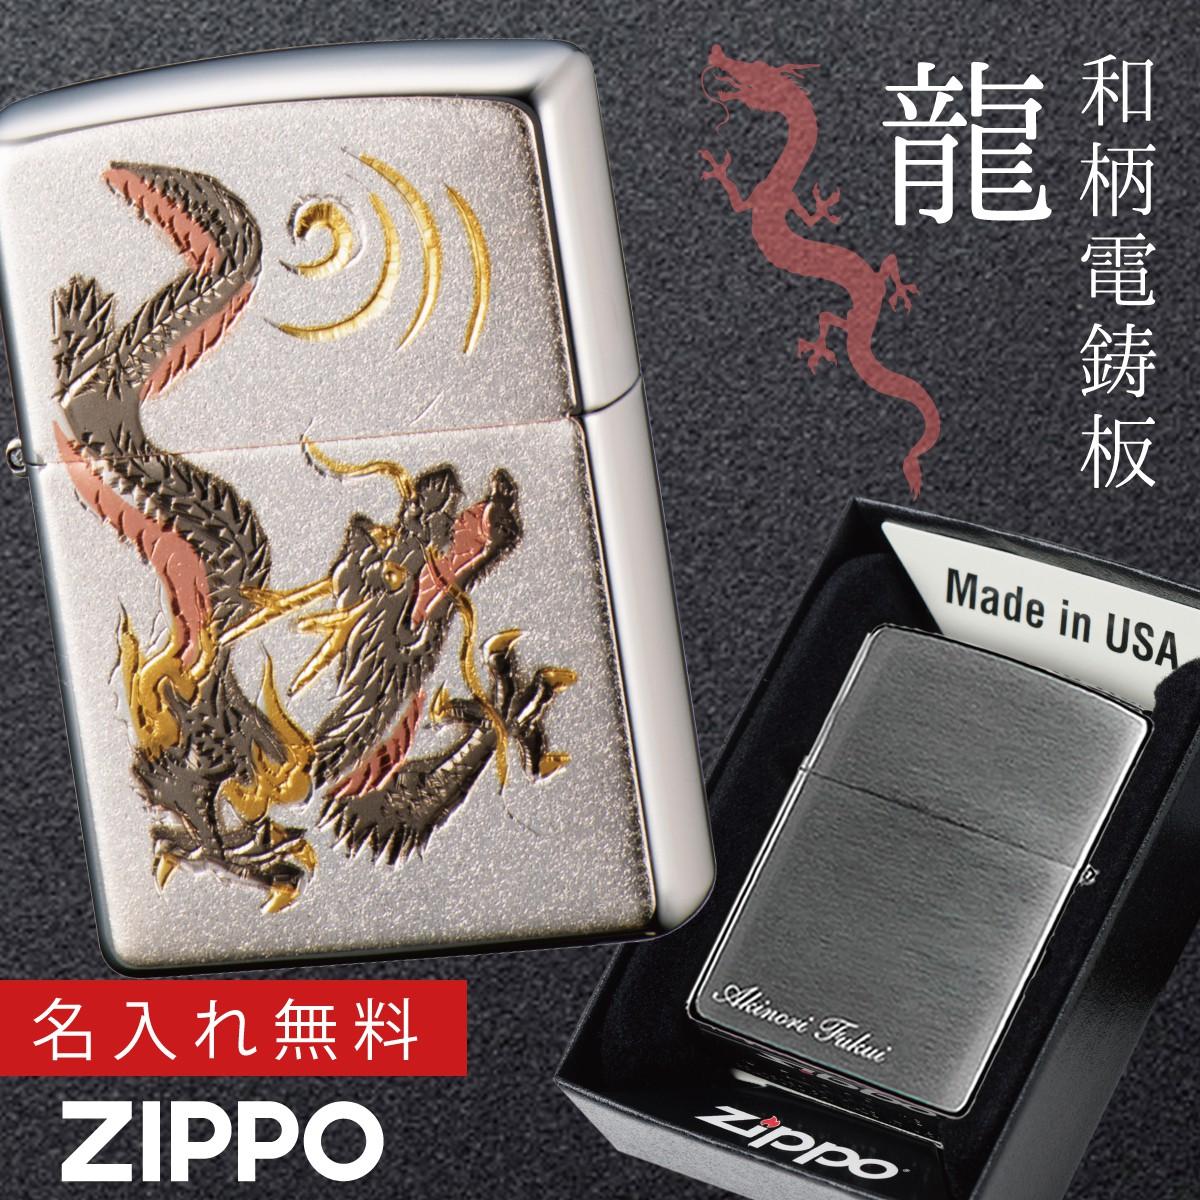 Lighterya Name Correspondence Put Zippo Lighter Oil Dragon Zp Casting Plate